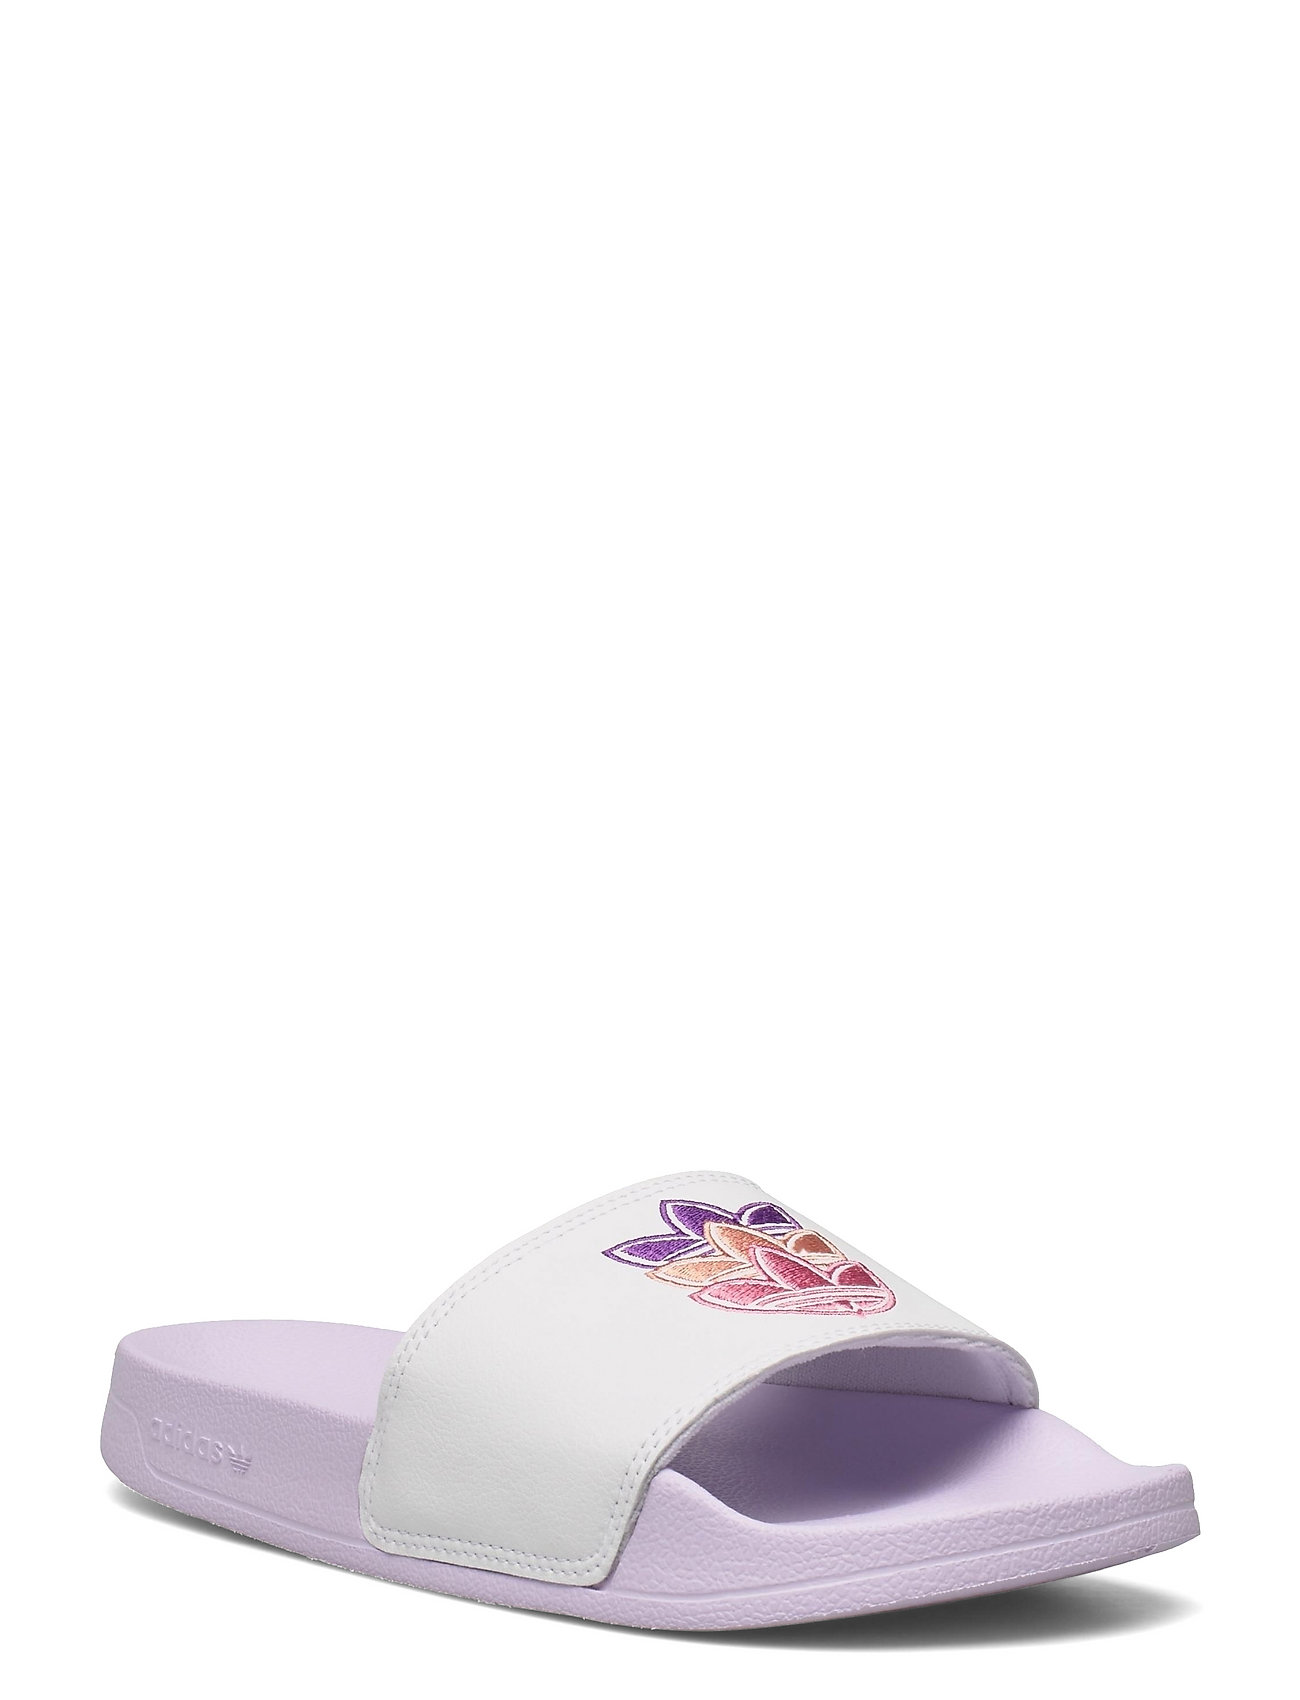 Adilette Lite Slides W Shoes Summer Shoes Pool Sliders Lilla Adidas Originals